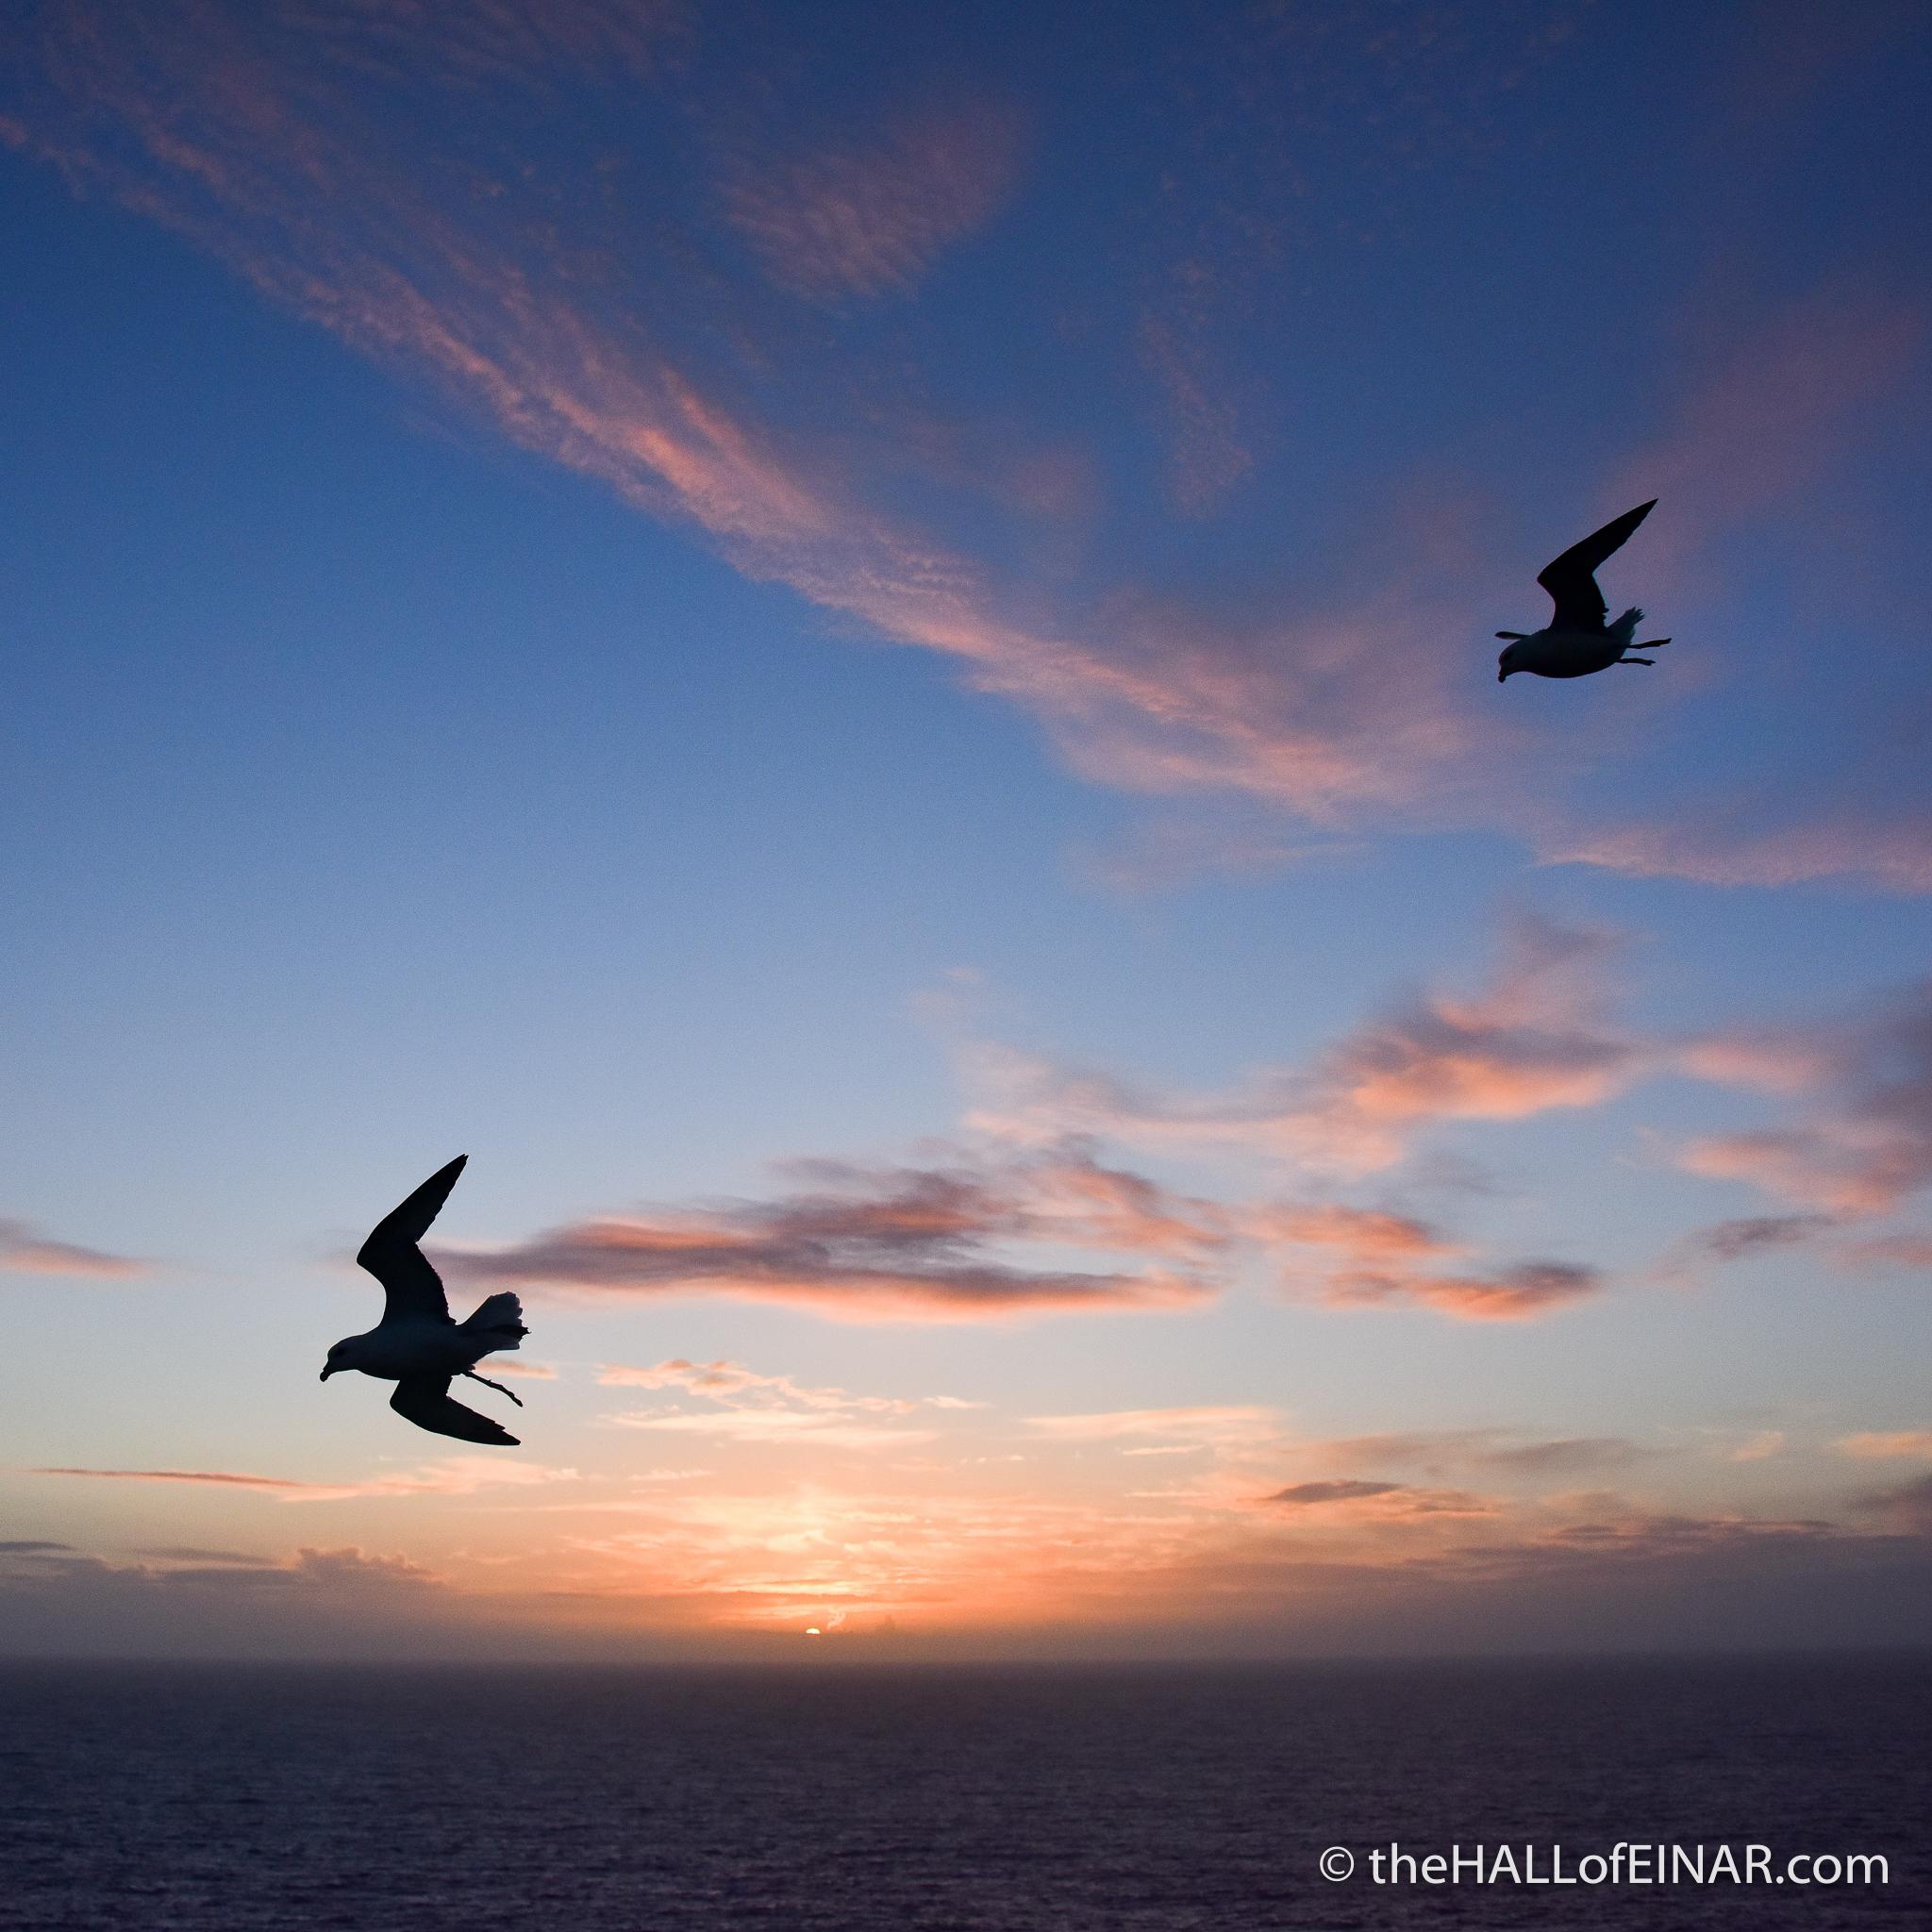 Sunset Fulmars - photograph (c) David Bailey (not the)